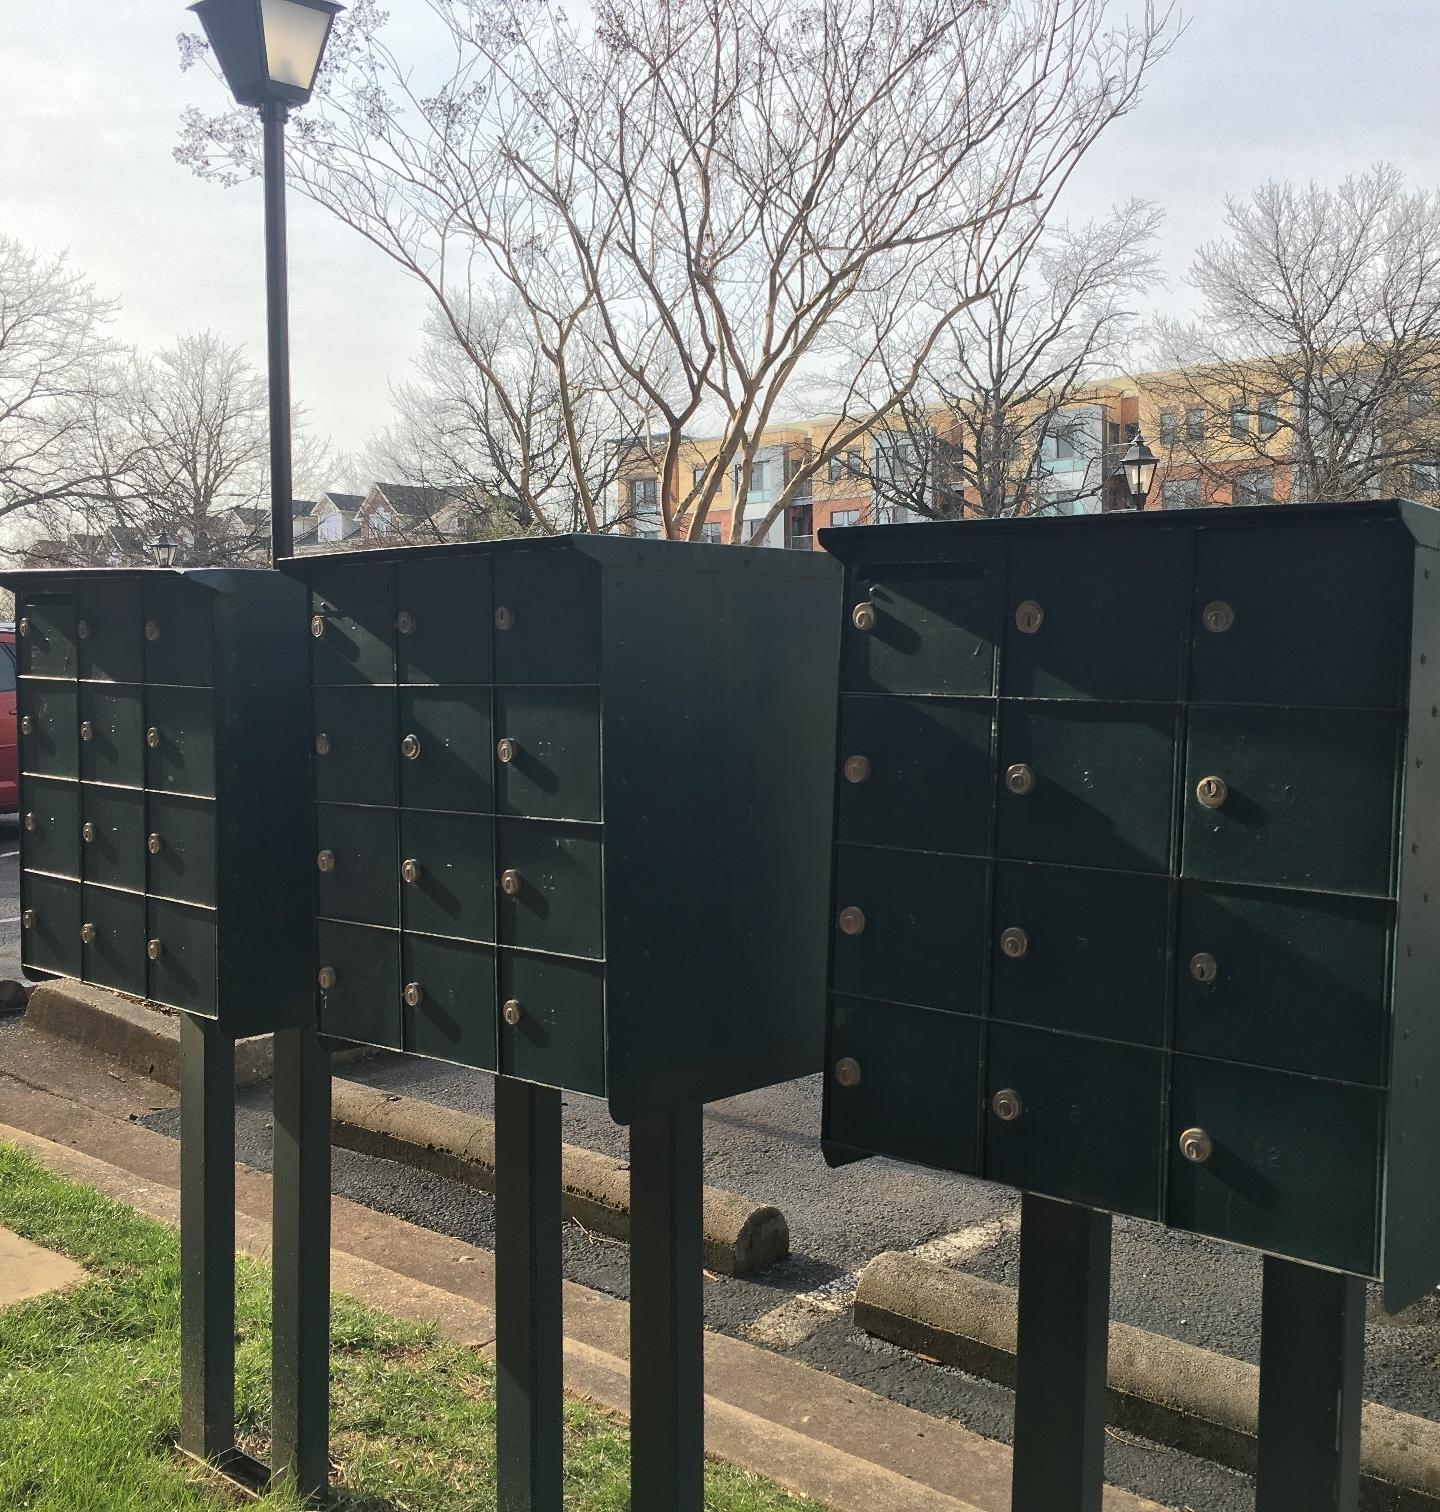 2017-03-24 mailboxes.jpg